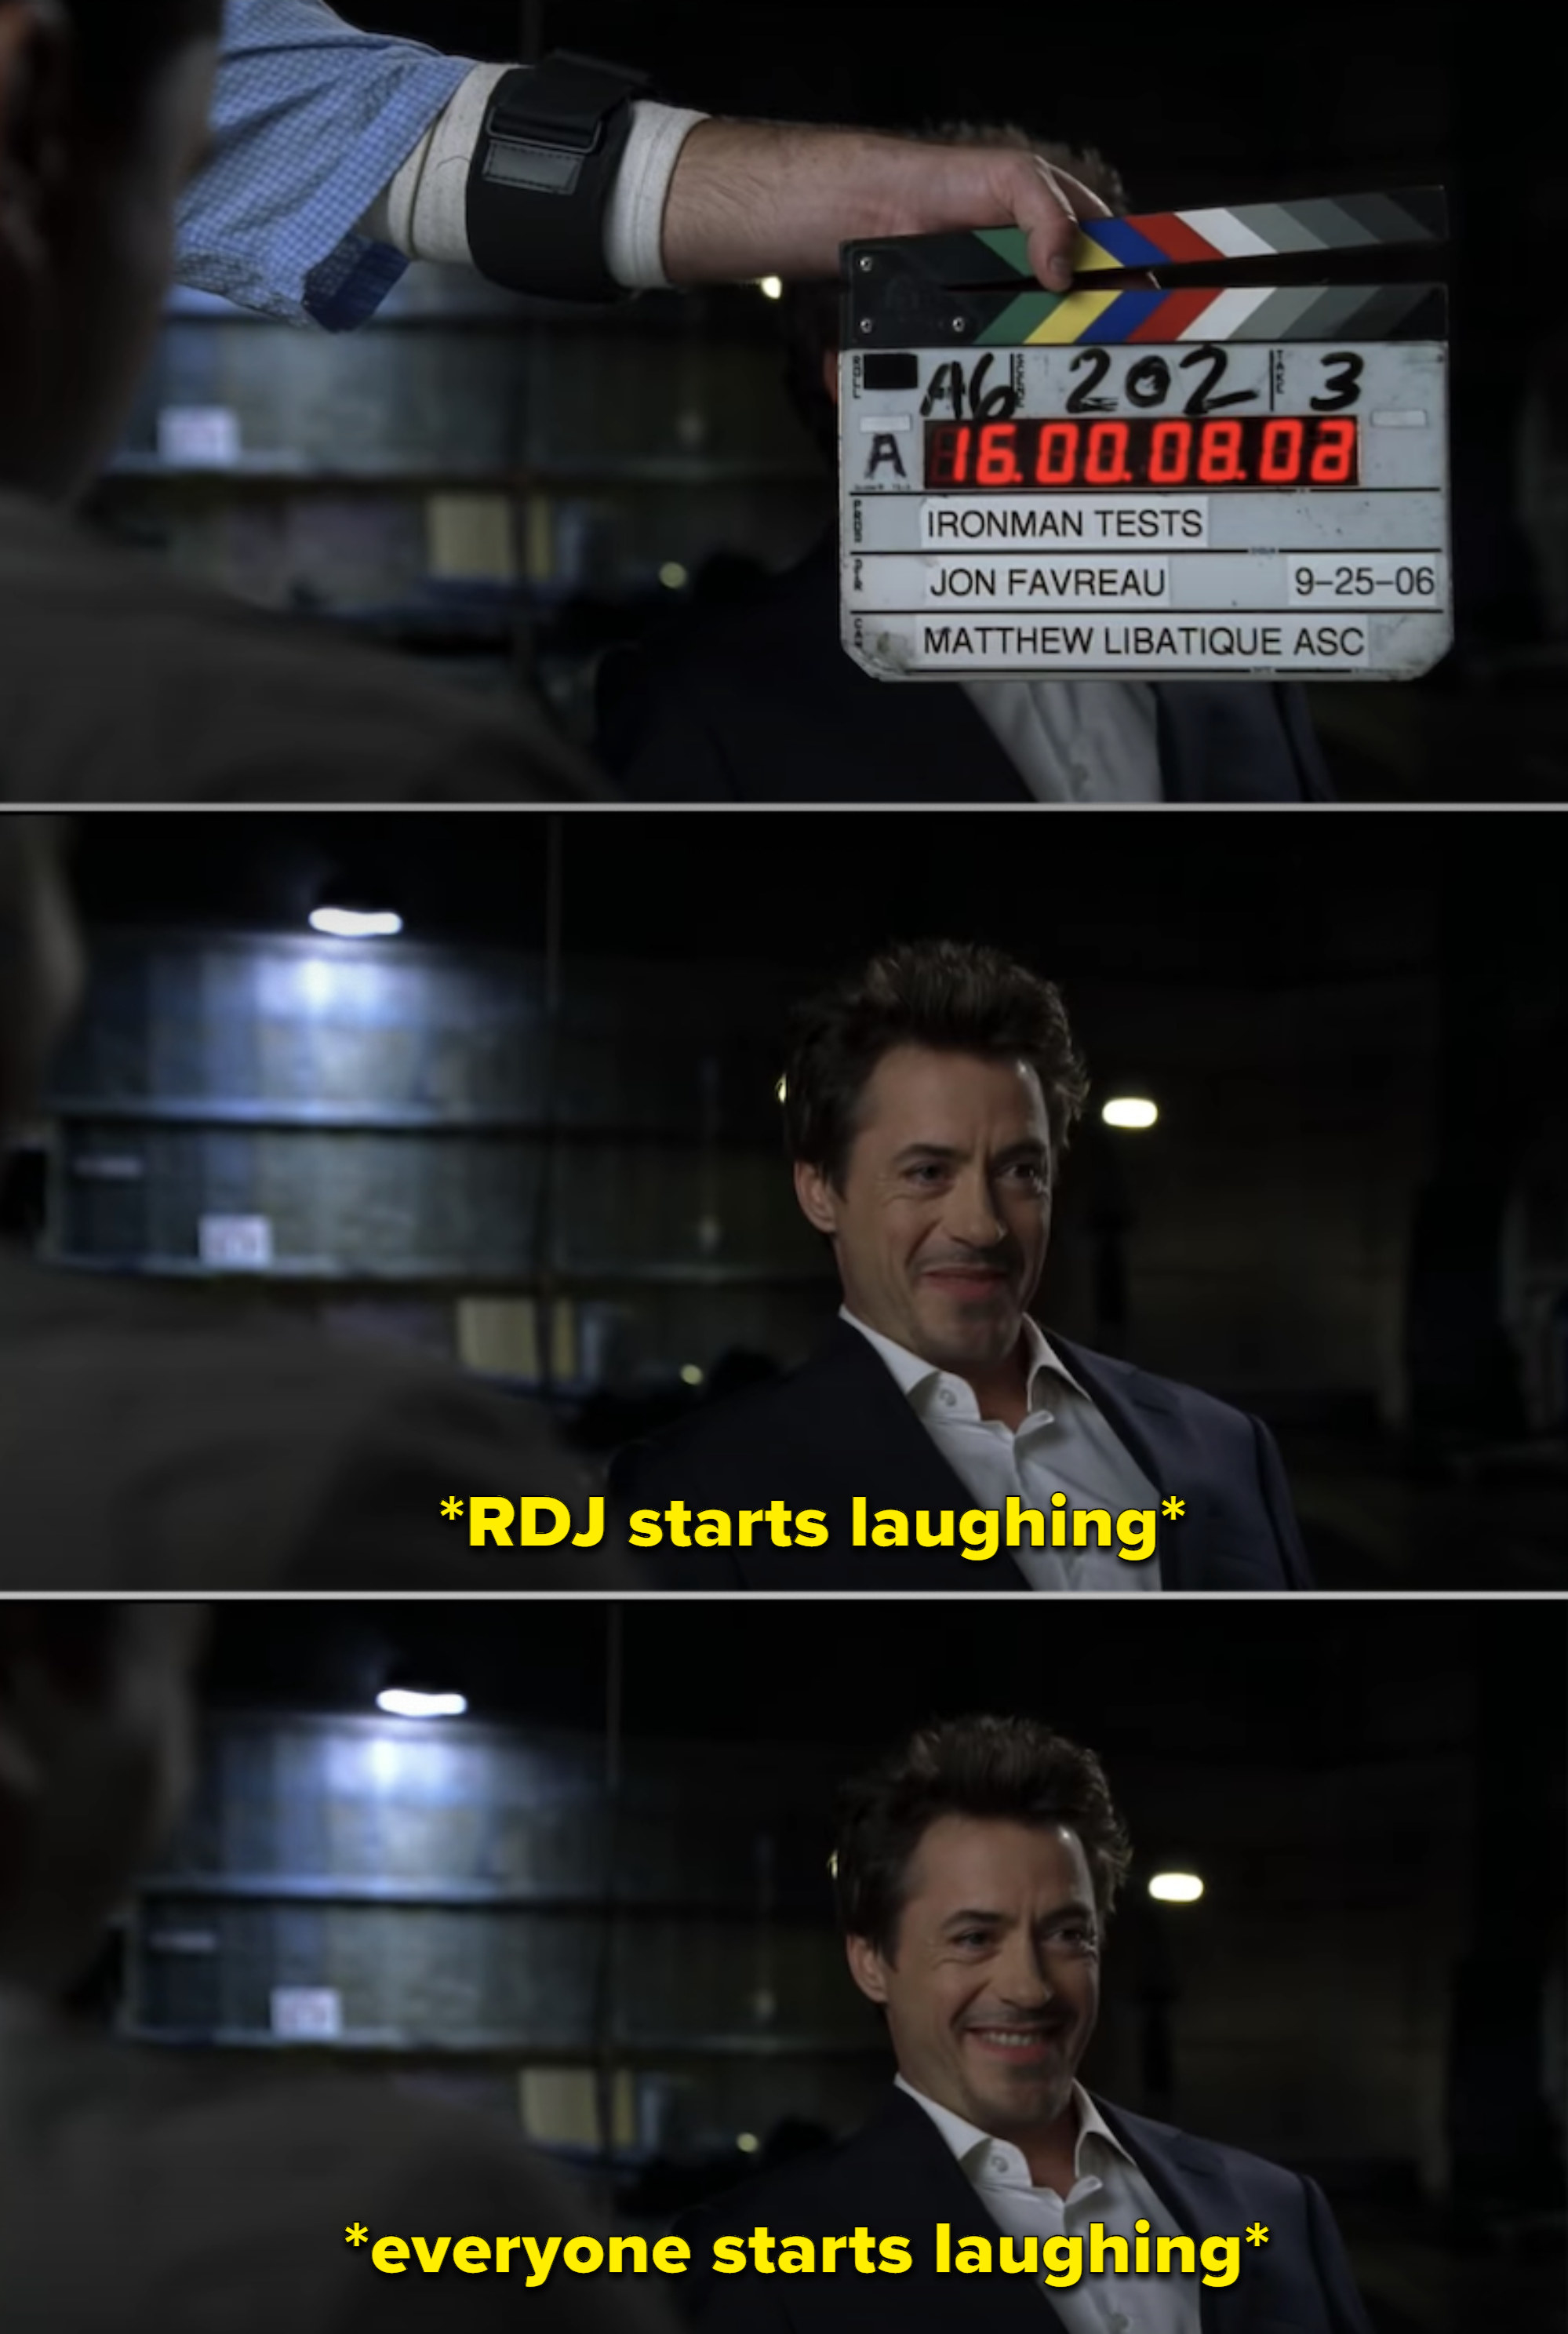 RDJ laughing during his screen test